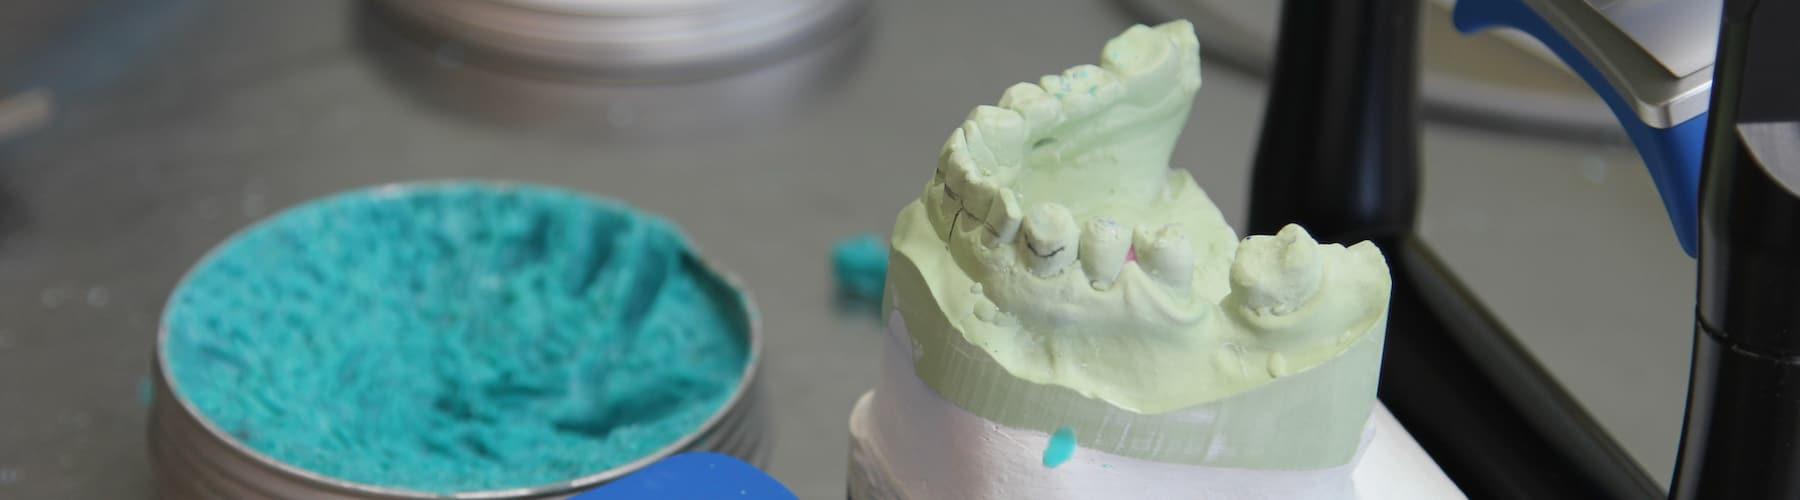 Dental Team - laboratorio odontotecnico a Firenze